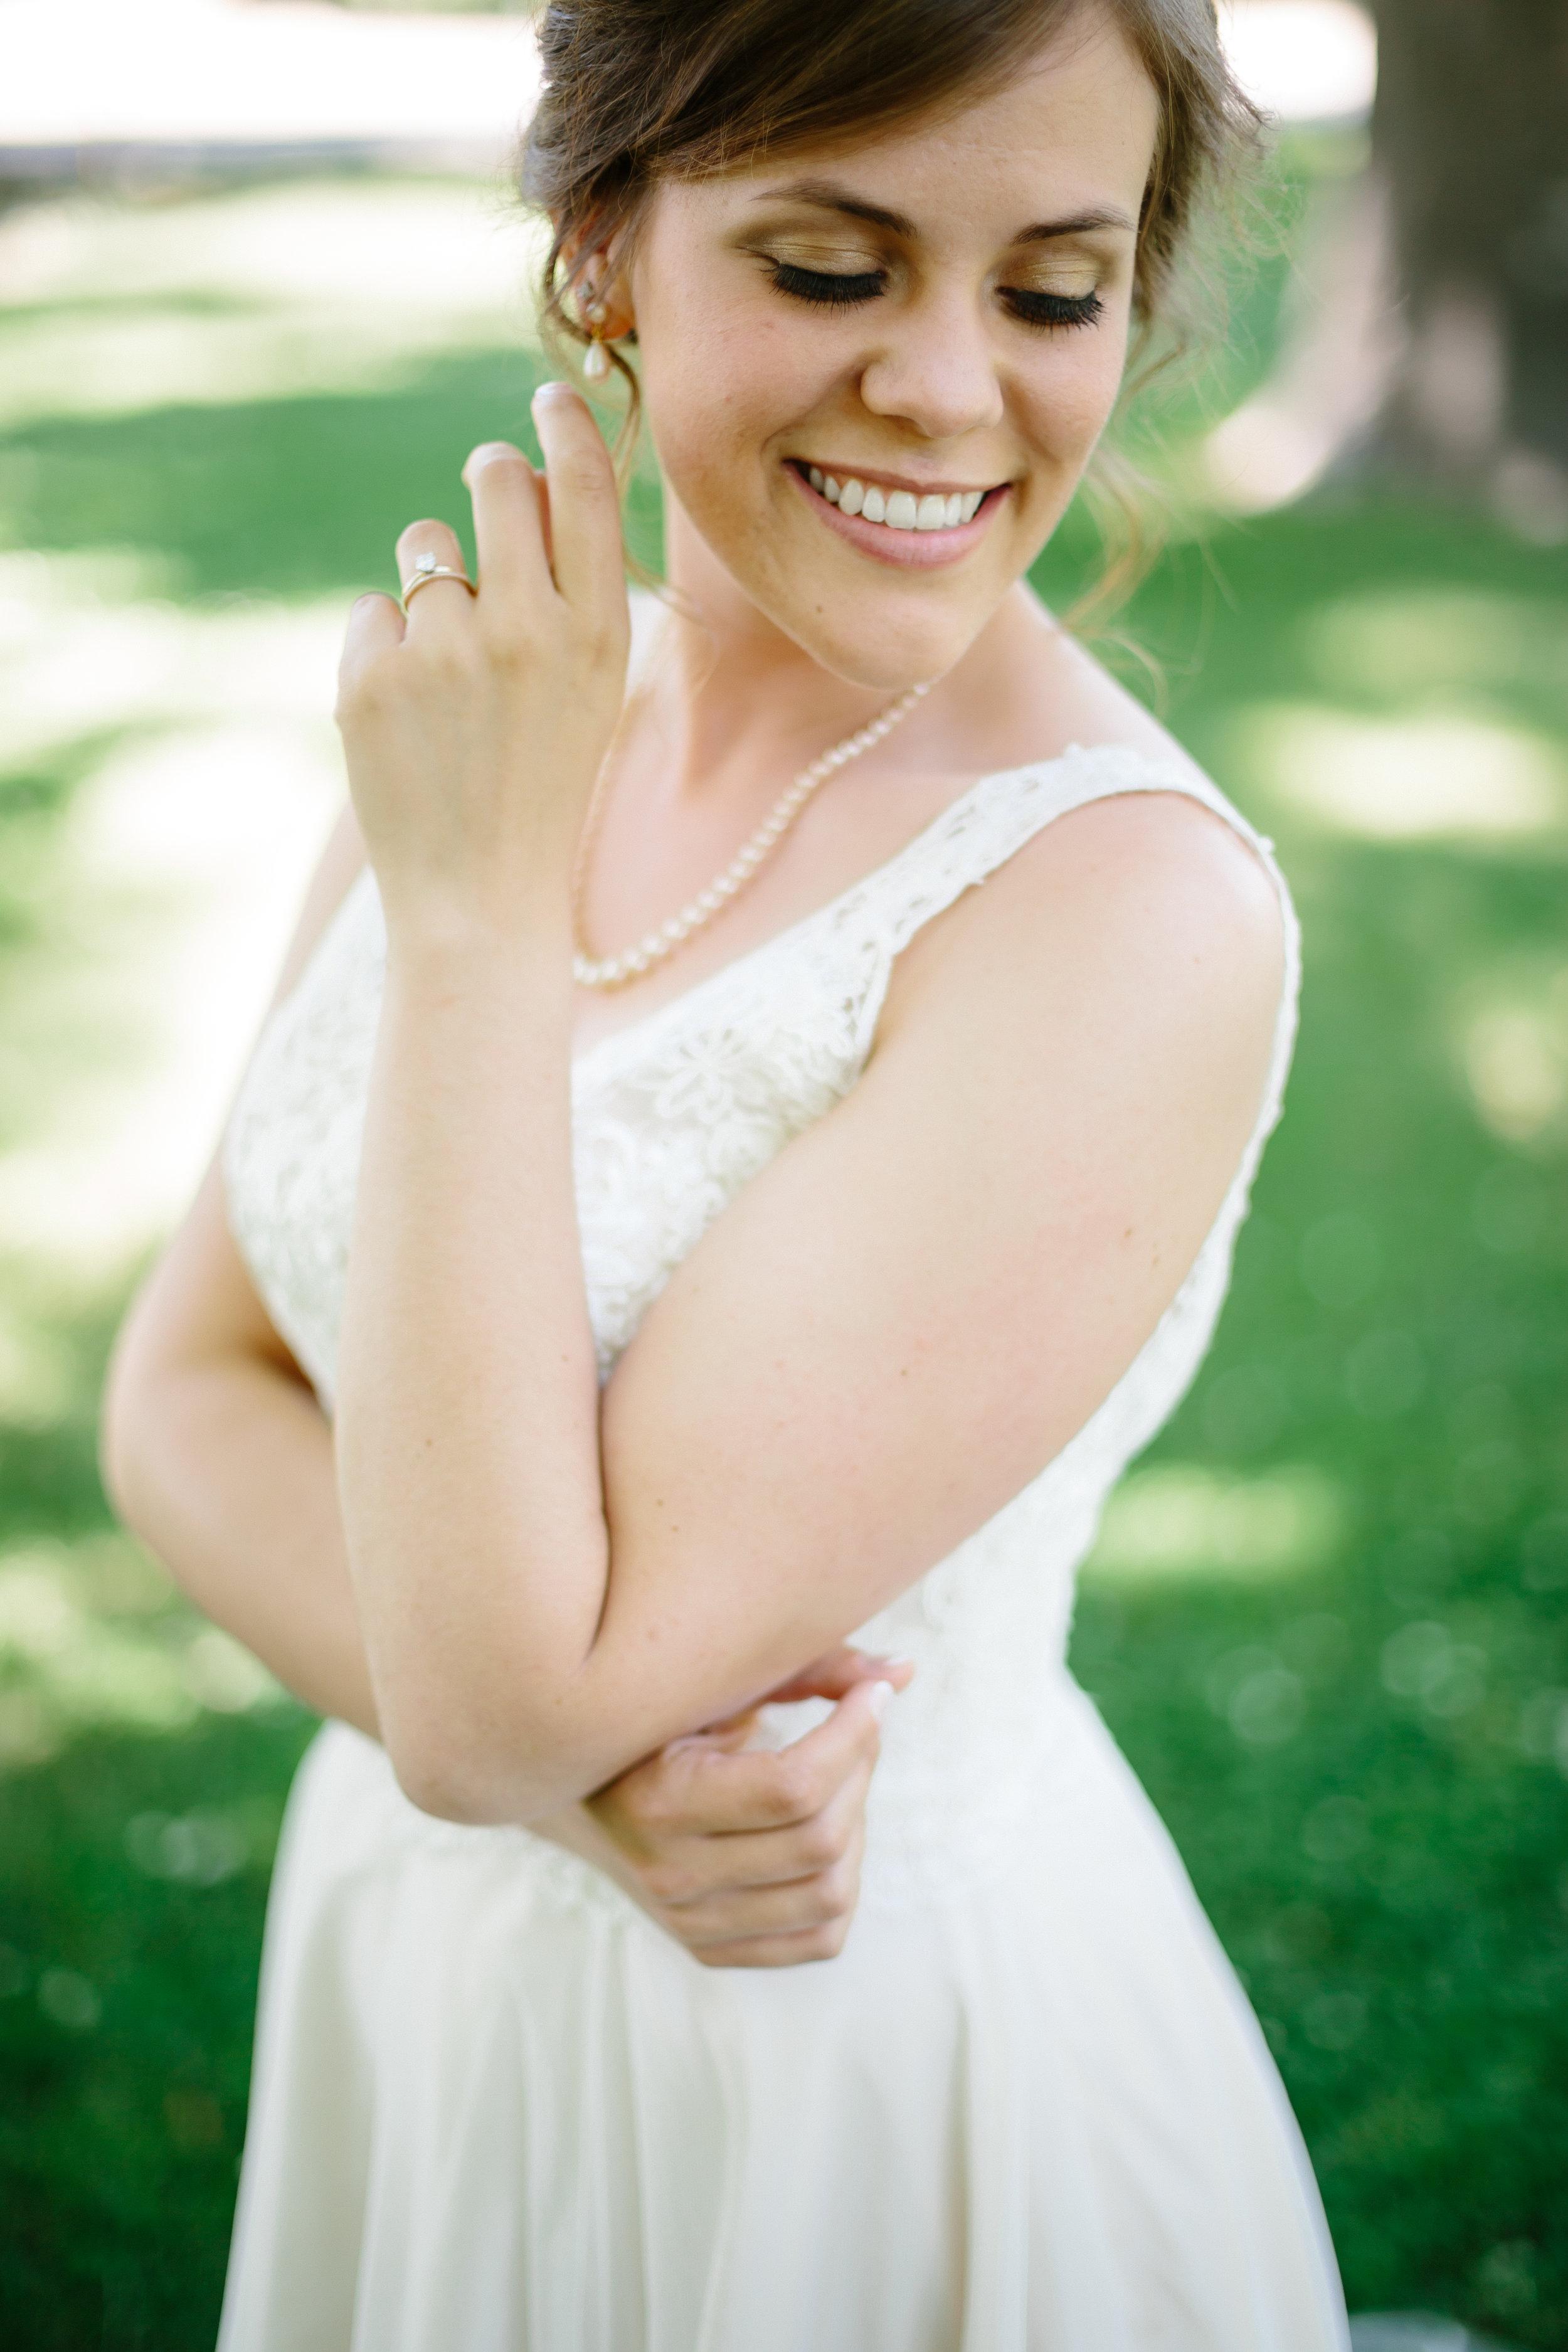 Jordan & Shantel Married - Idaho - Corrie Mick Photography-98.jpg